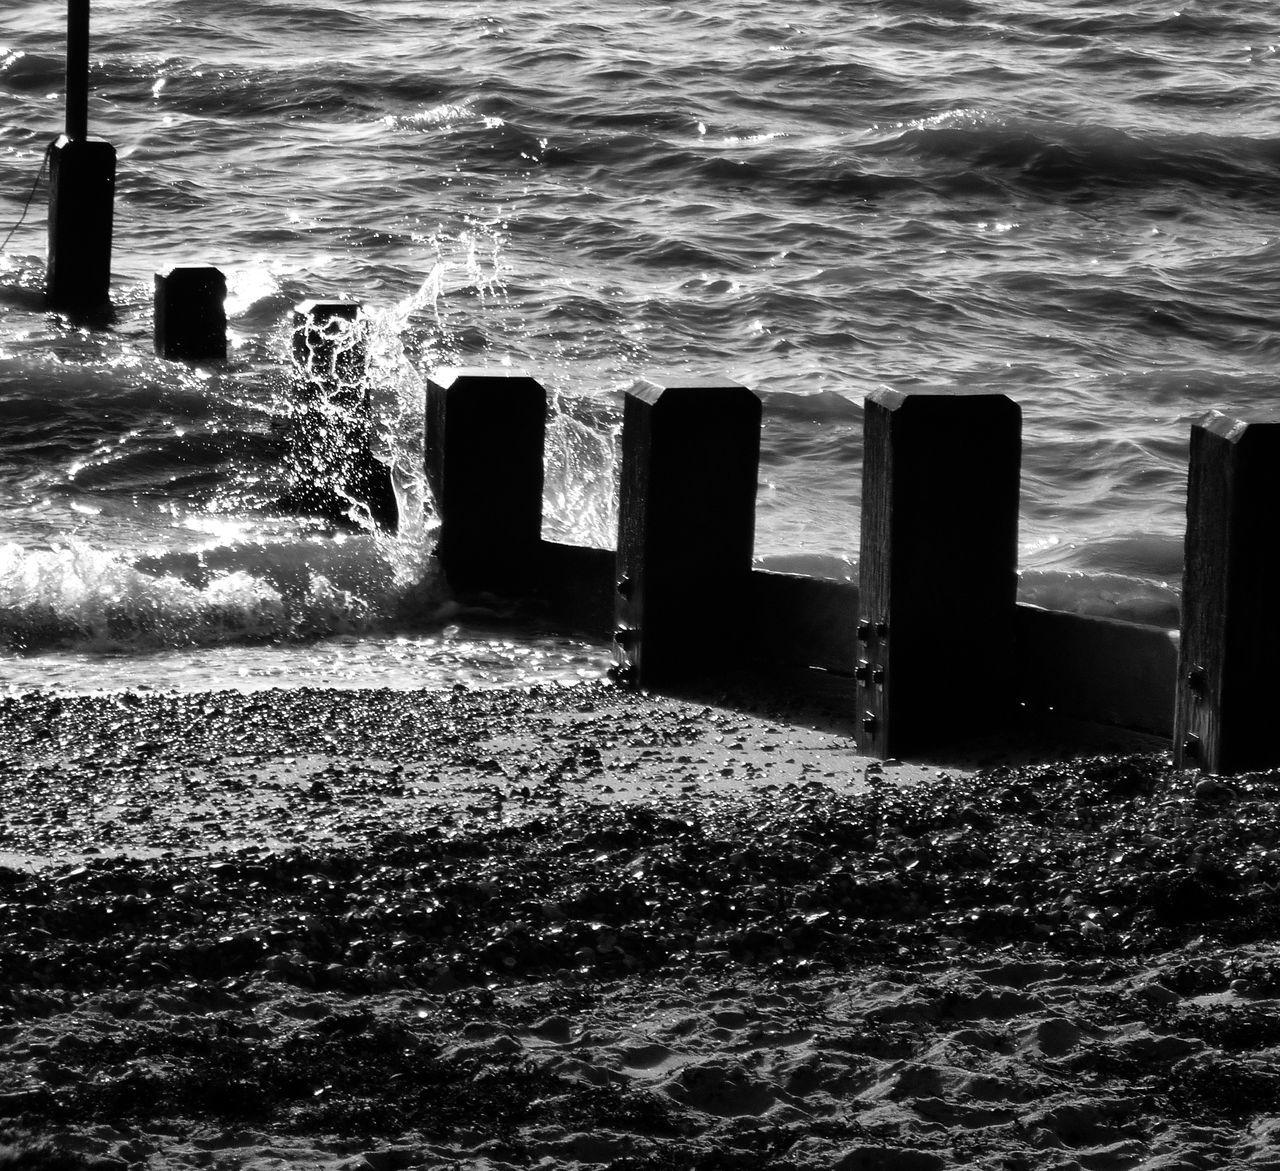 Southend seafront. Water Sea Wave Nature No People Southend On Sea Southend Groyne Seaside Seafront British Seaside Splash Tide